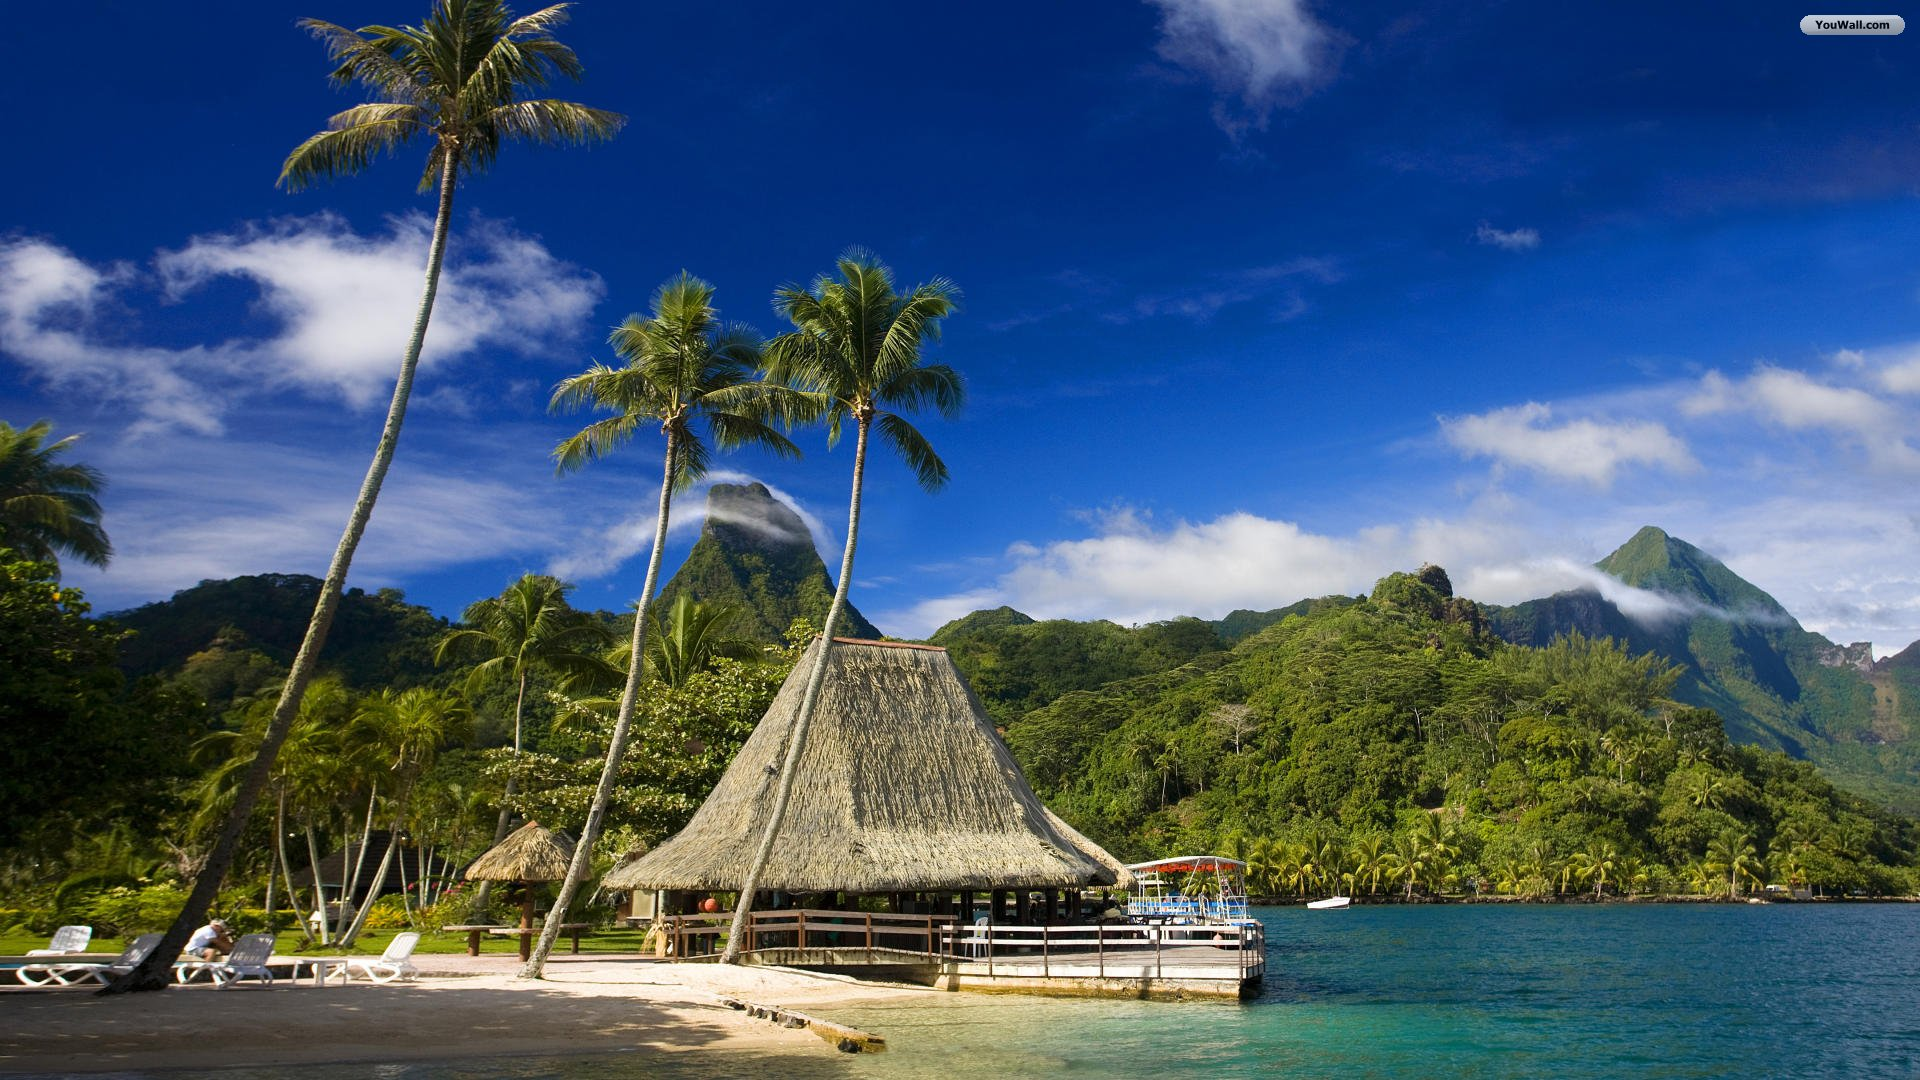 1366x768 beautiful tropical island - photo #24